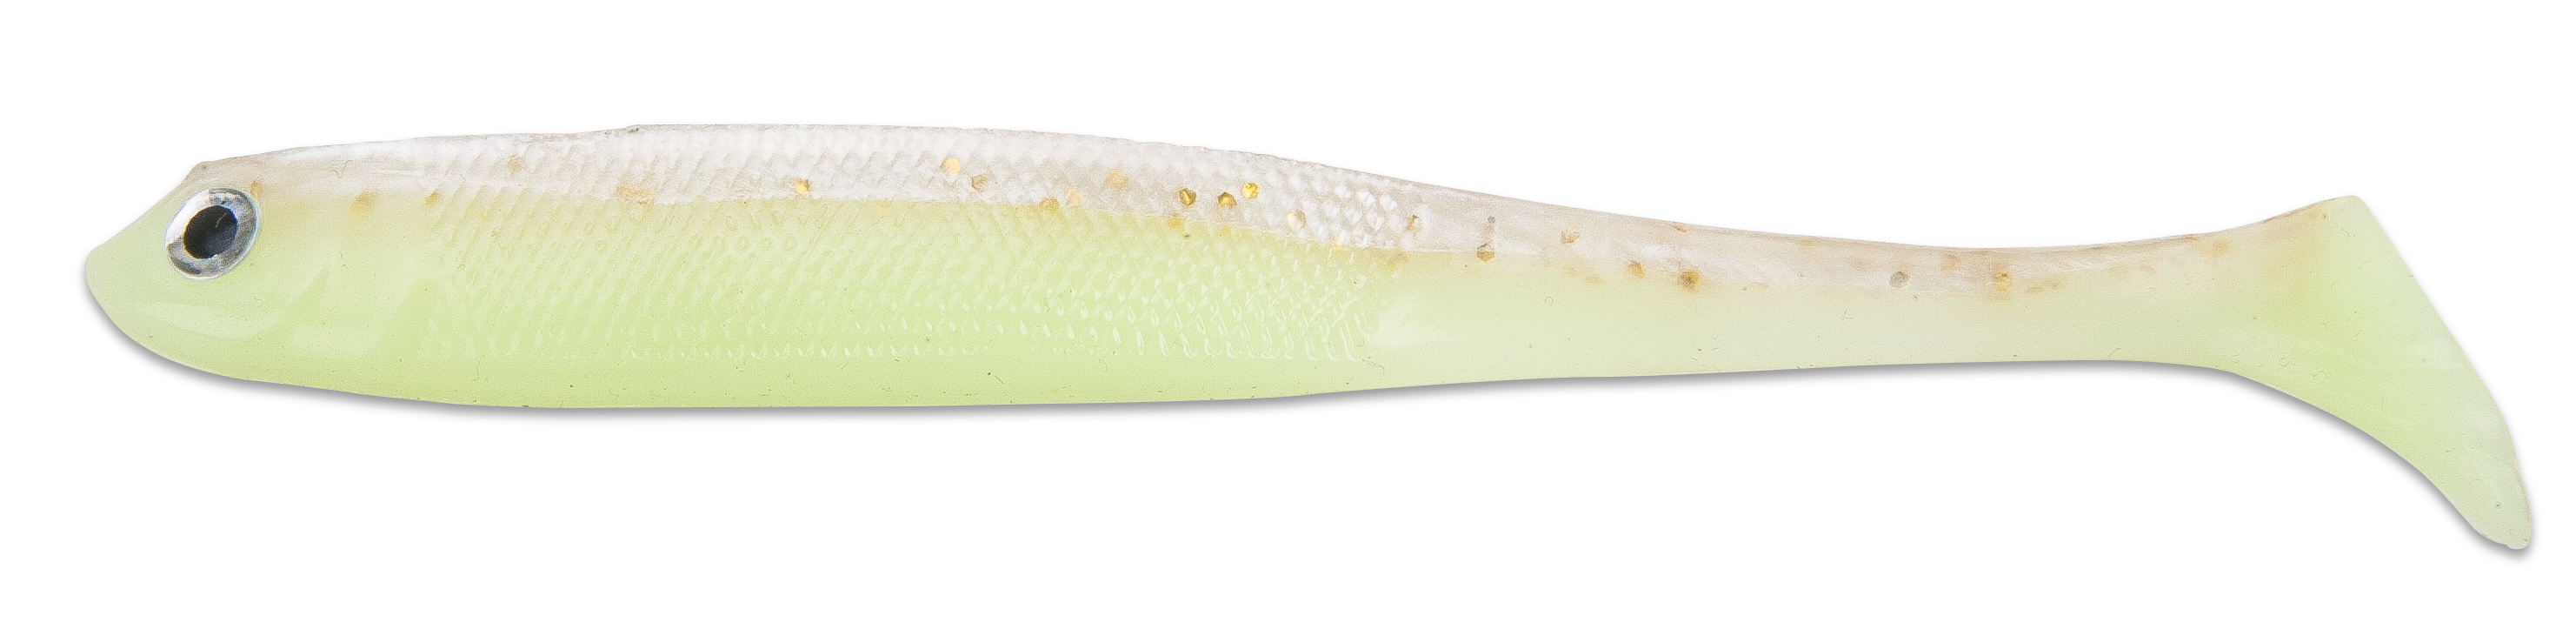 Iron Claw gumová nástraha Slim Jim 16 cm Vzor LU, 3ks